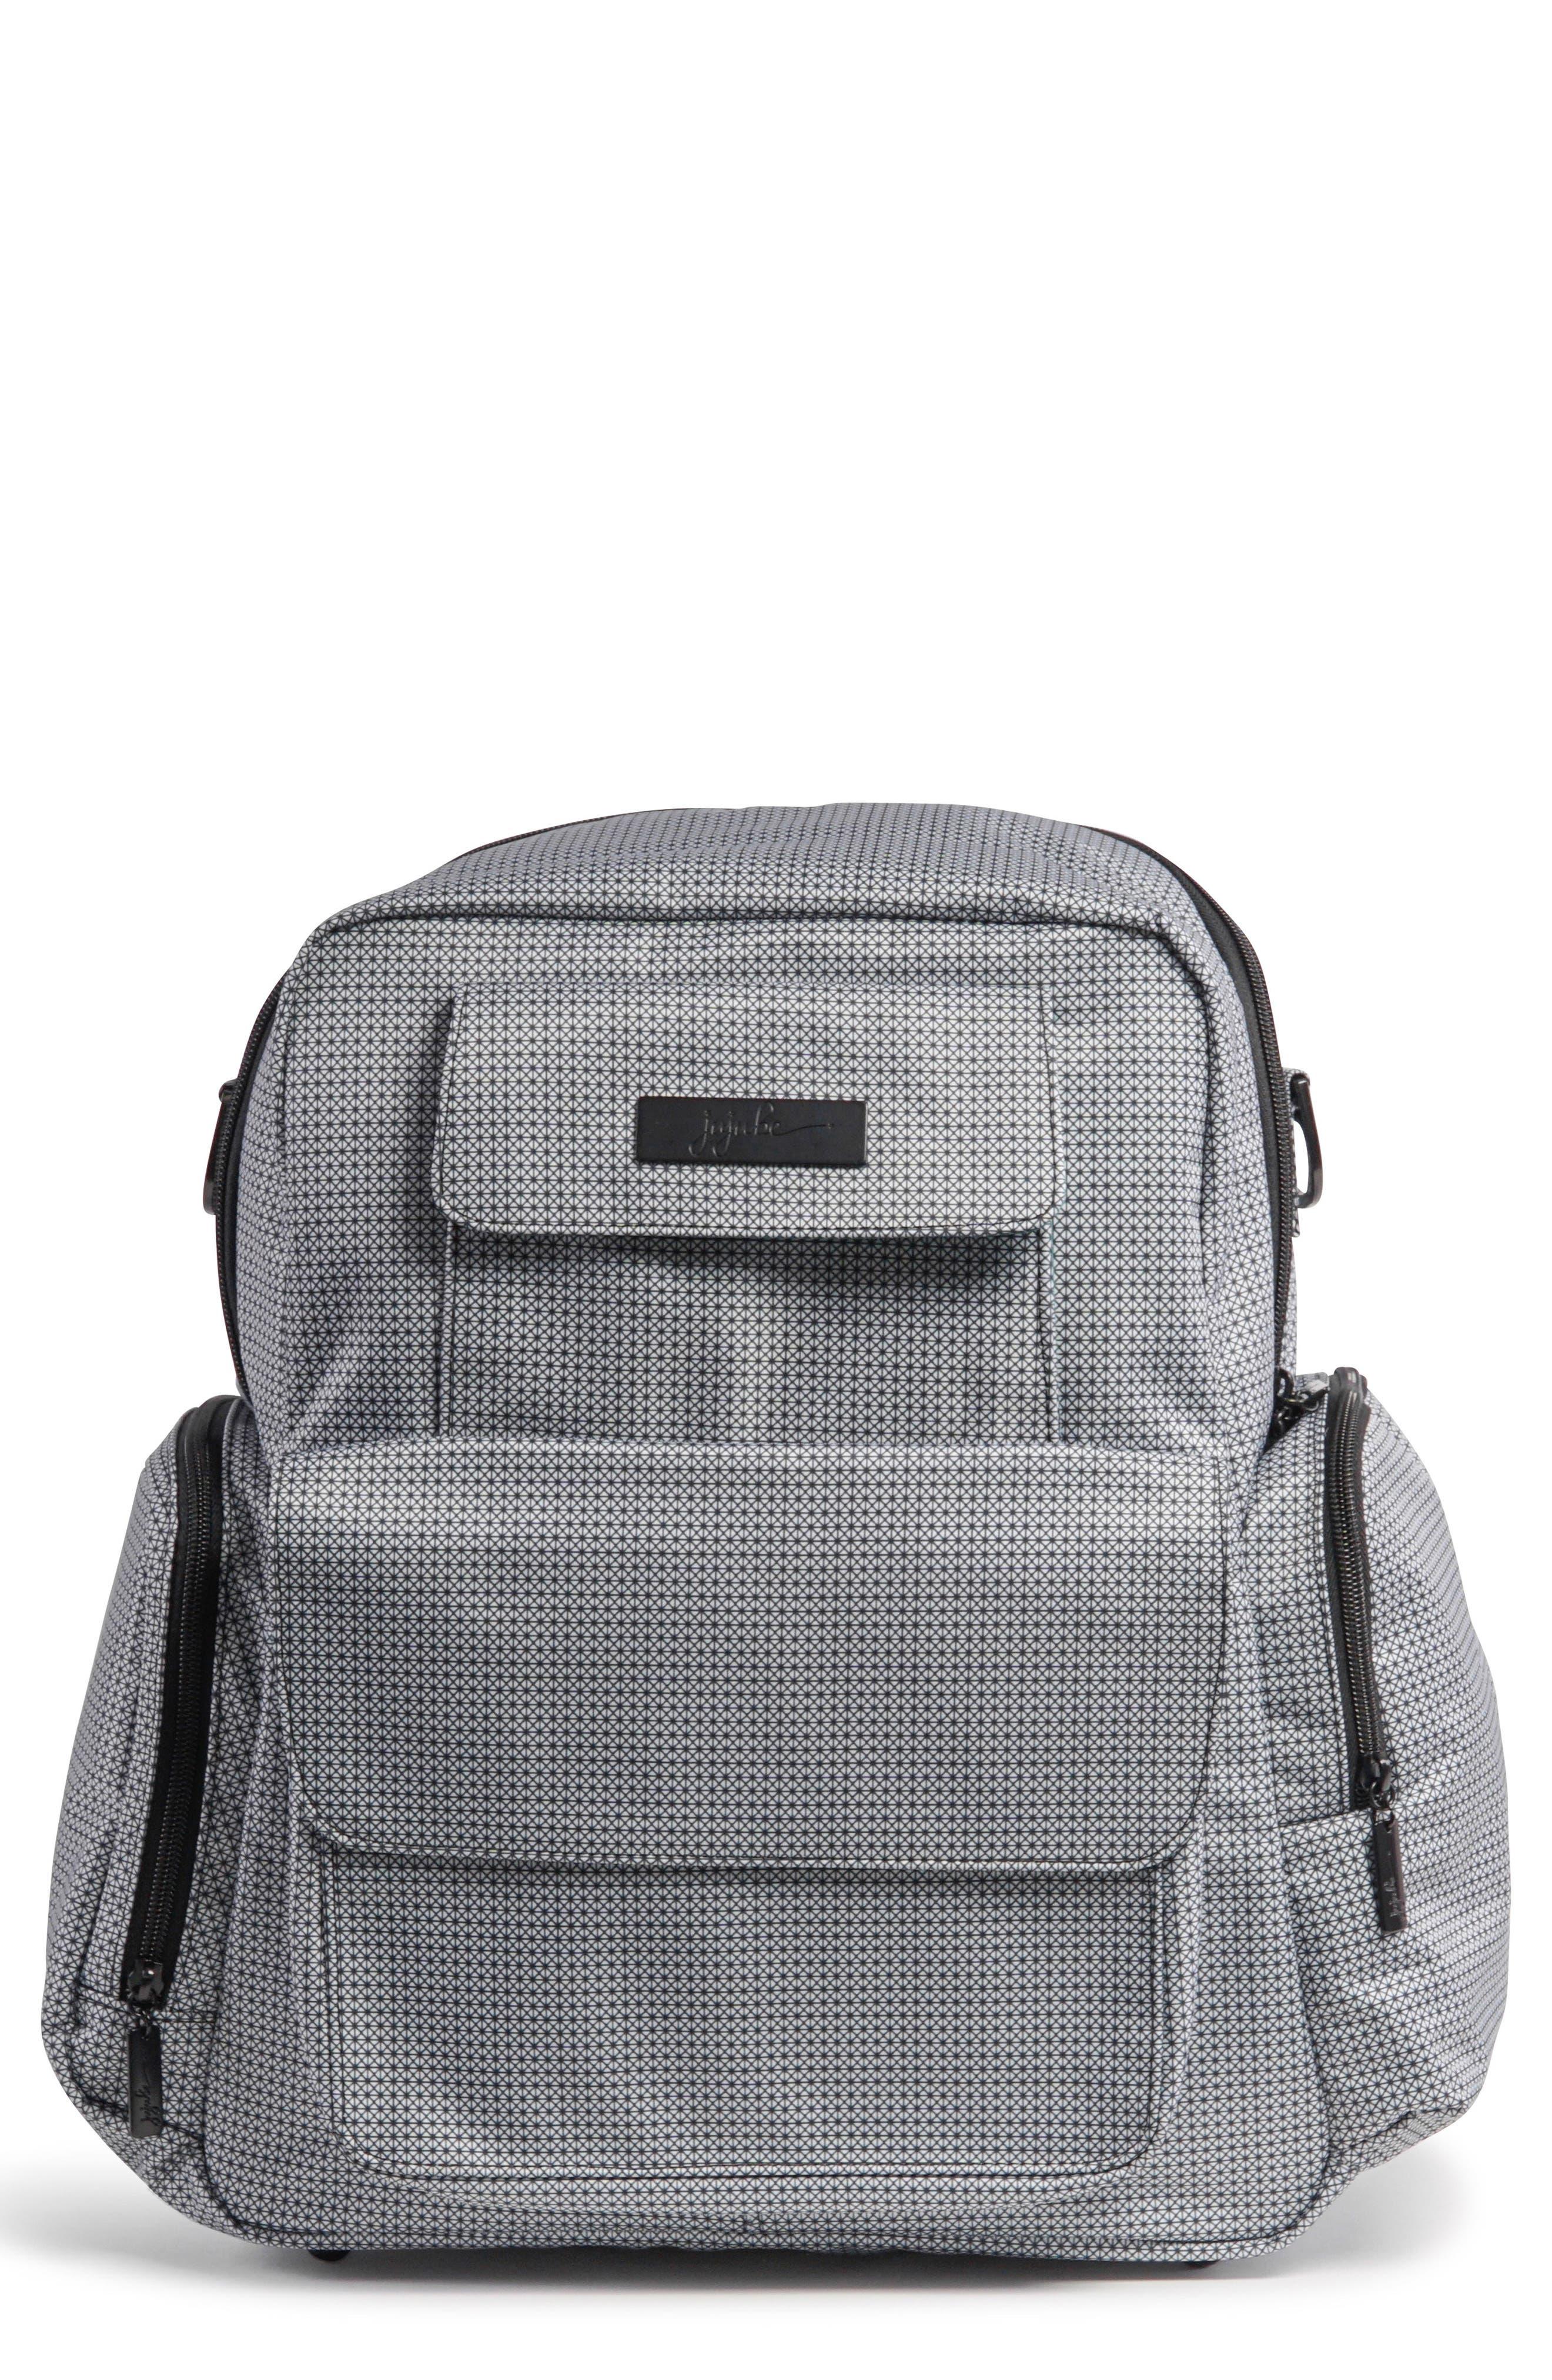 Be Nurtured Pumping Backpack,                             Main thumbnail 1, color,                             BLACK MATRIX